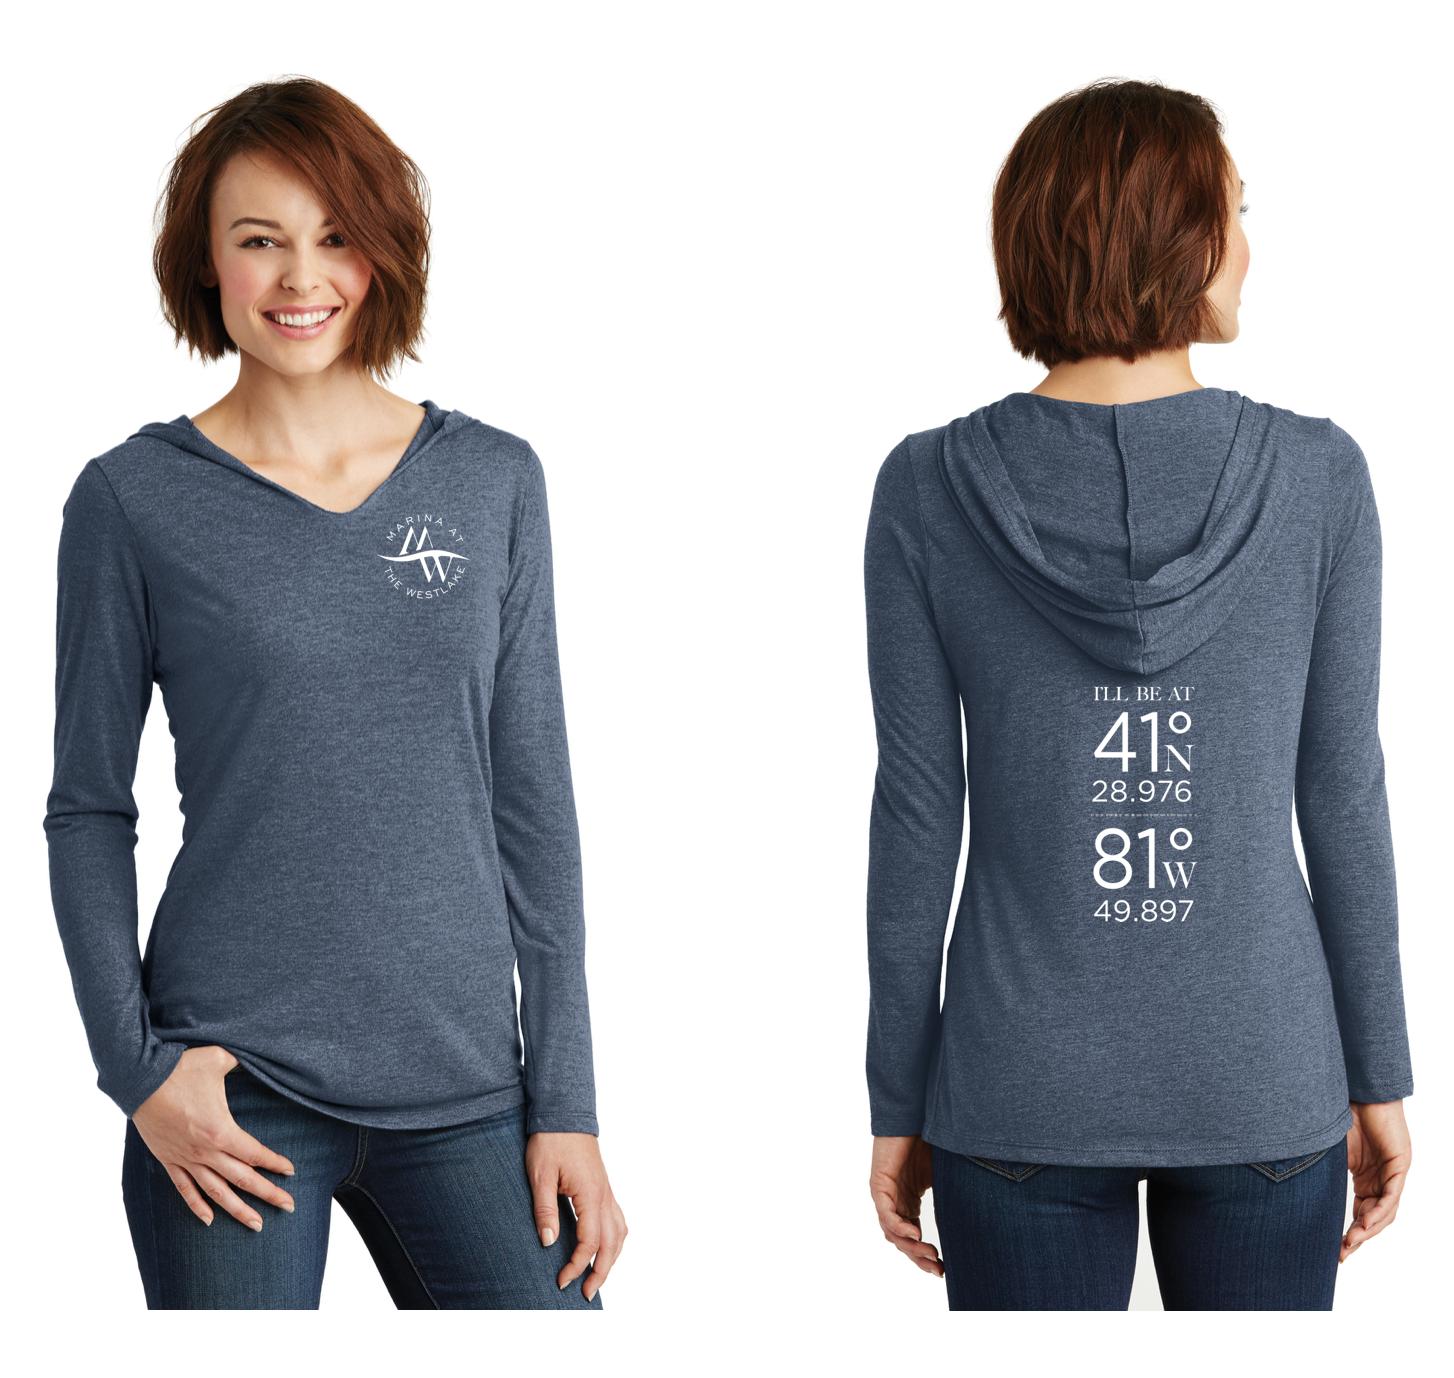 Ladies Long-Sleeve Hooded Shirts